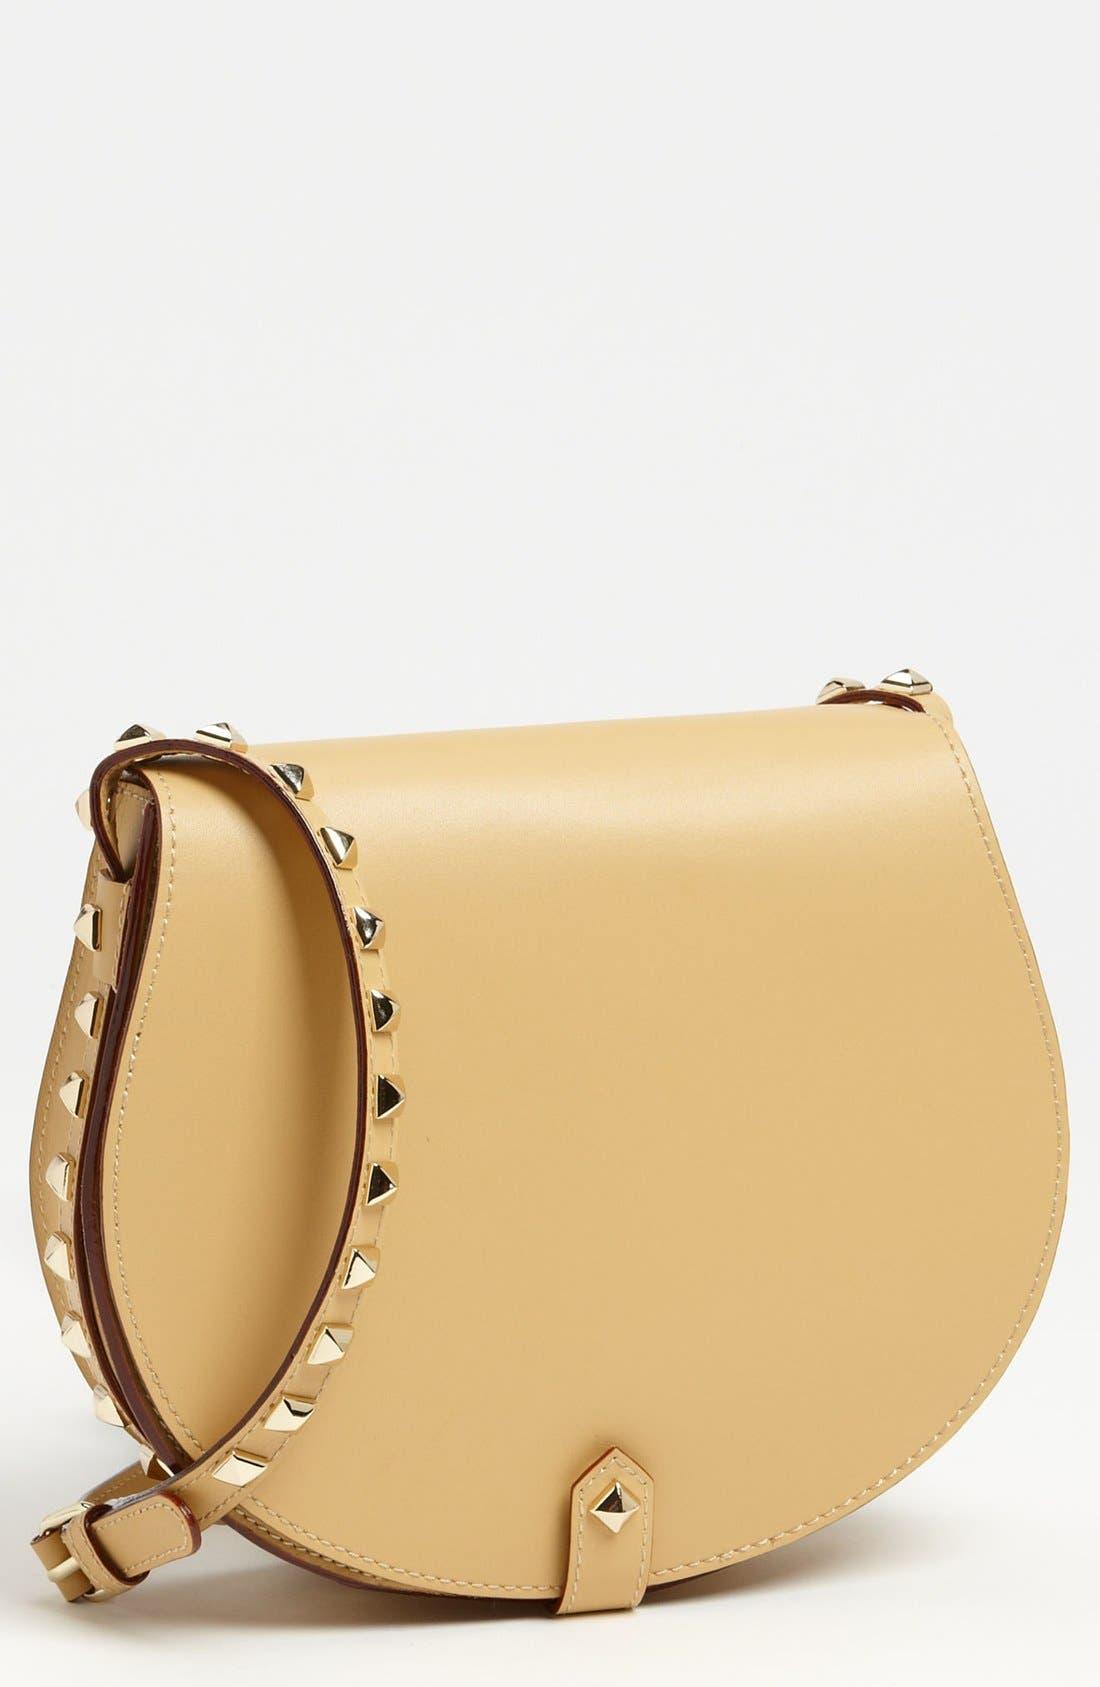 Alternate Image 1 Selected - Rebecca Minkoff 'Skylar' Studded Crossbody Bag